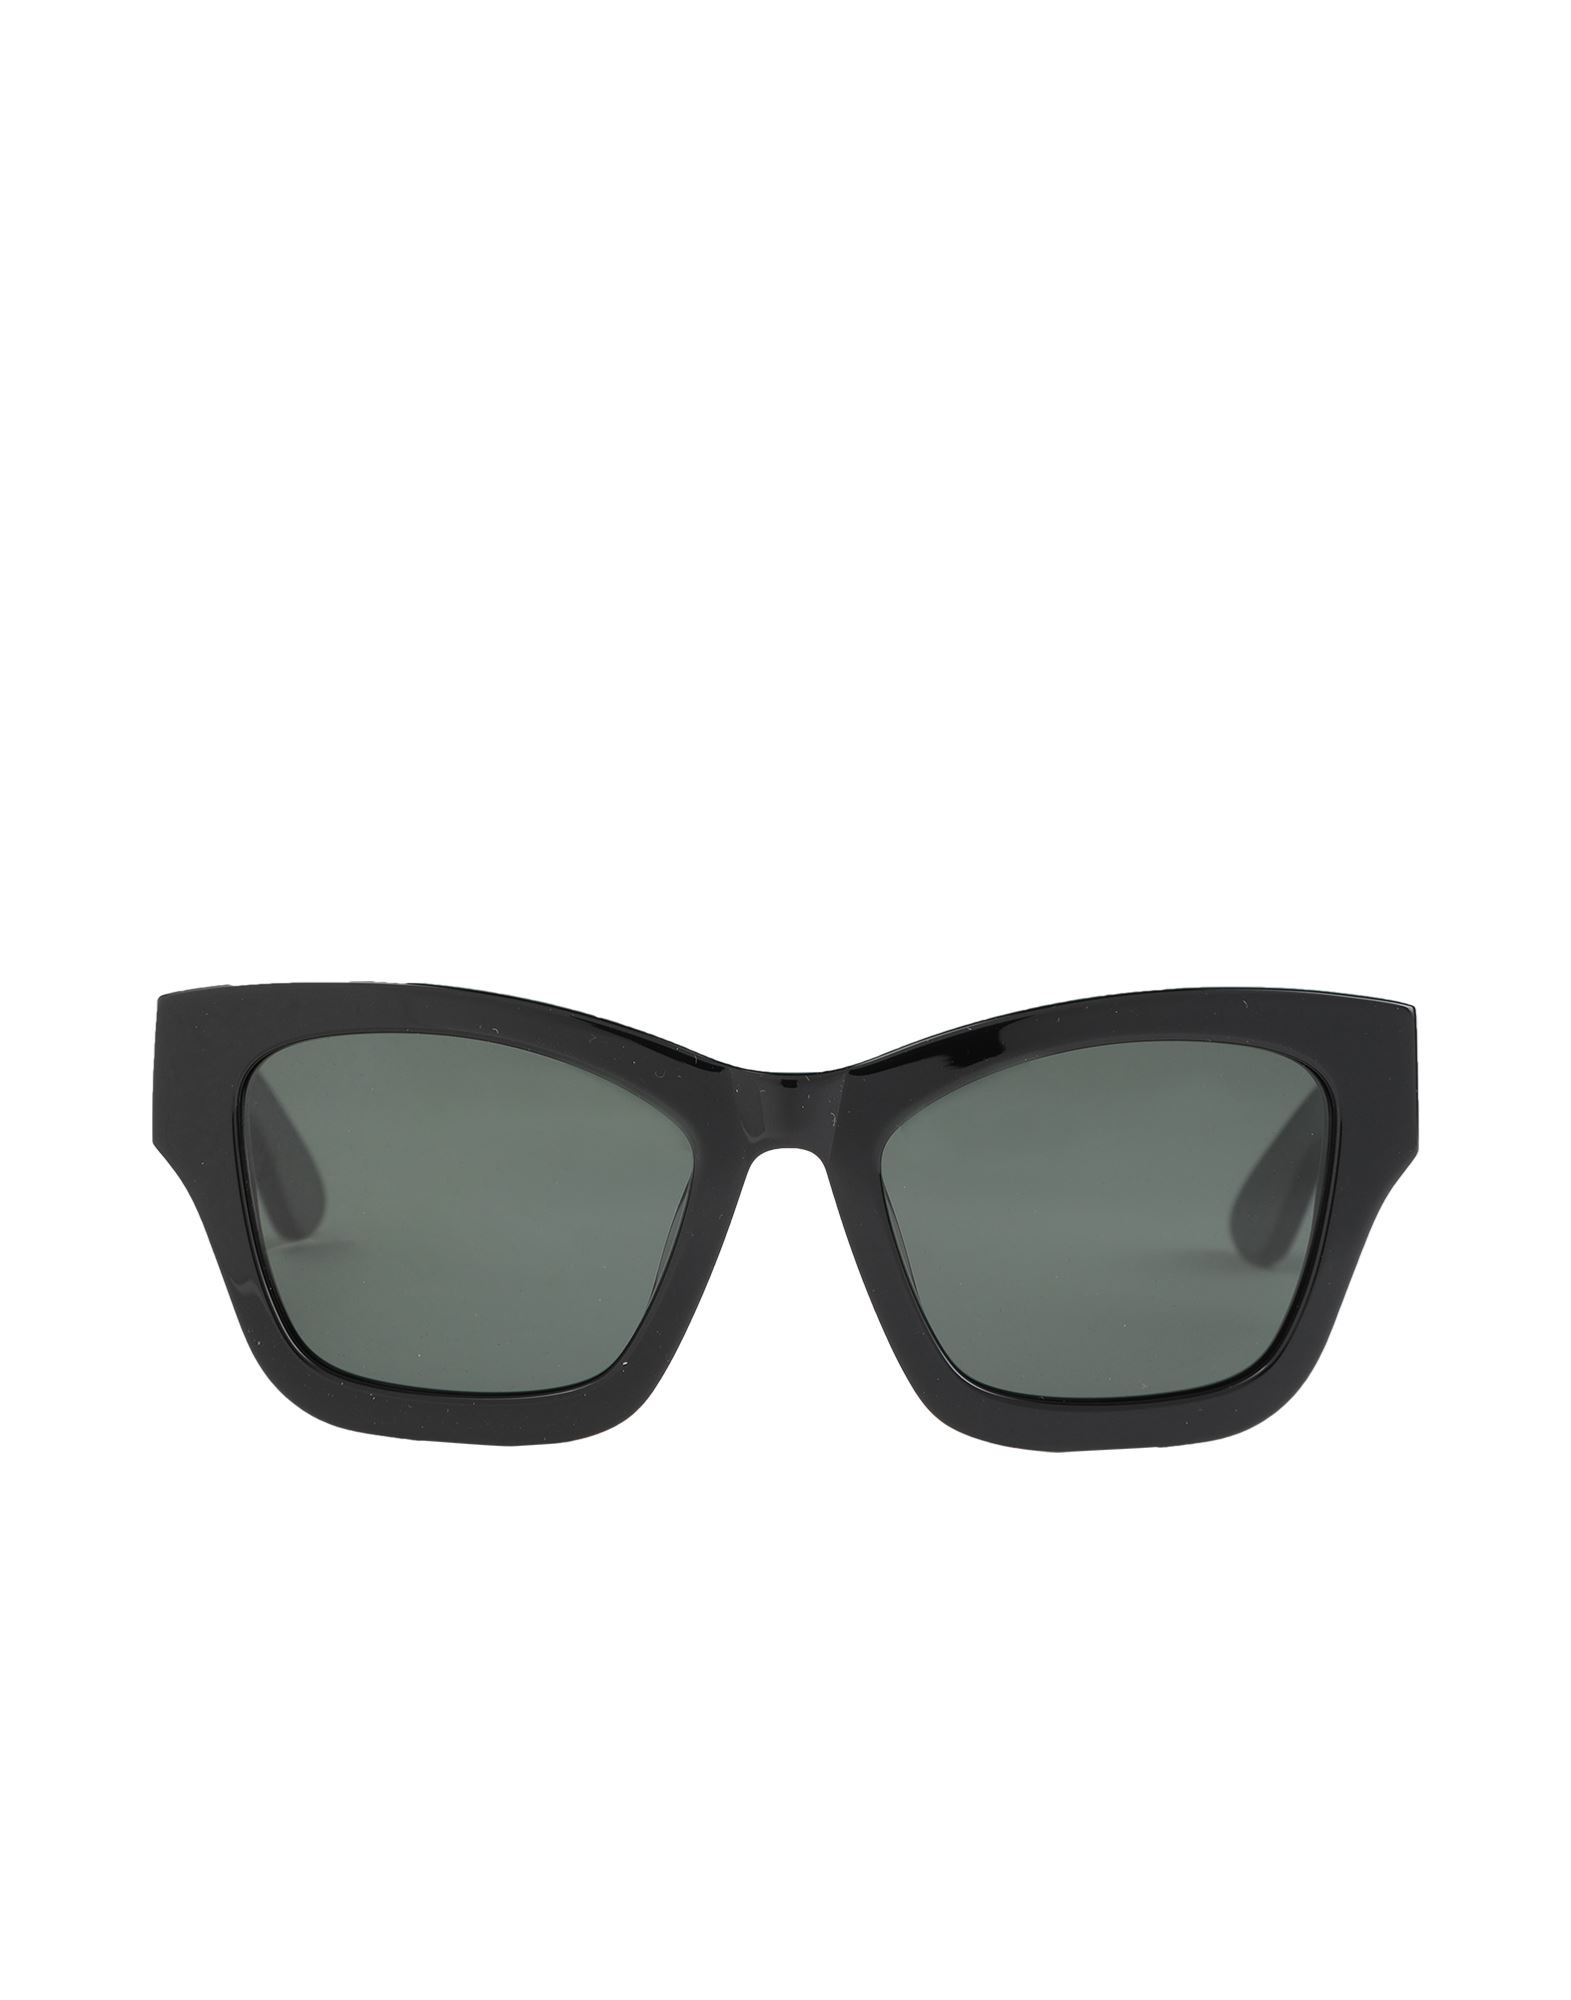 HAN KJØBENHAVN Sunglasses - Item 46737547